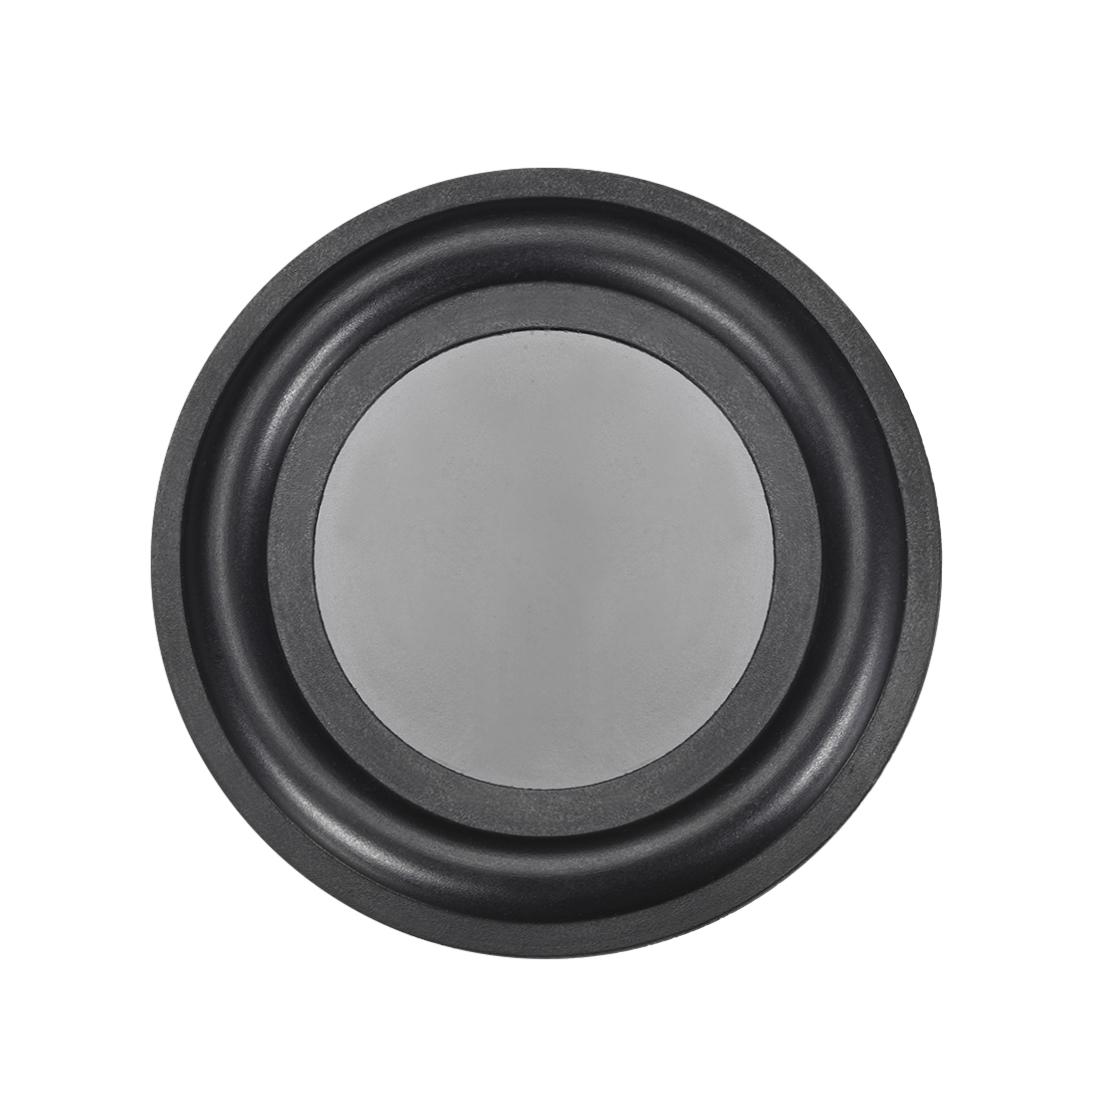 "3.5"" 92mm Bass Speaker Passive Radiator Rubber Vibration Plate DIY Repair"